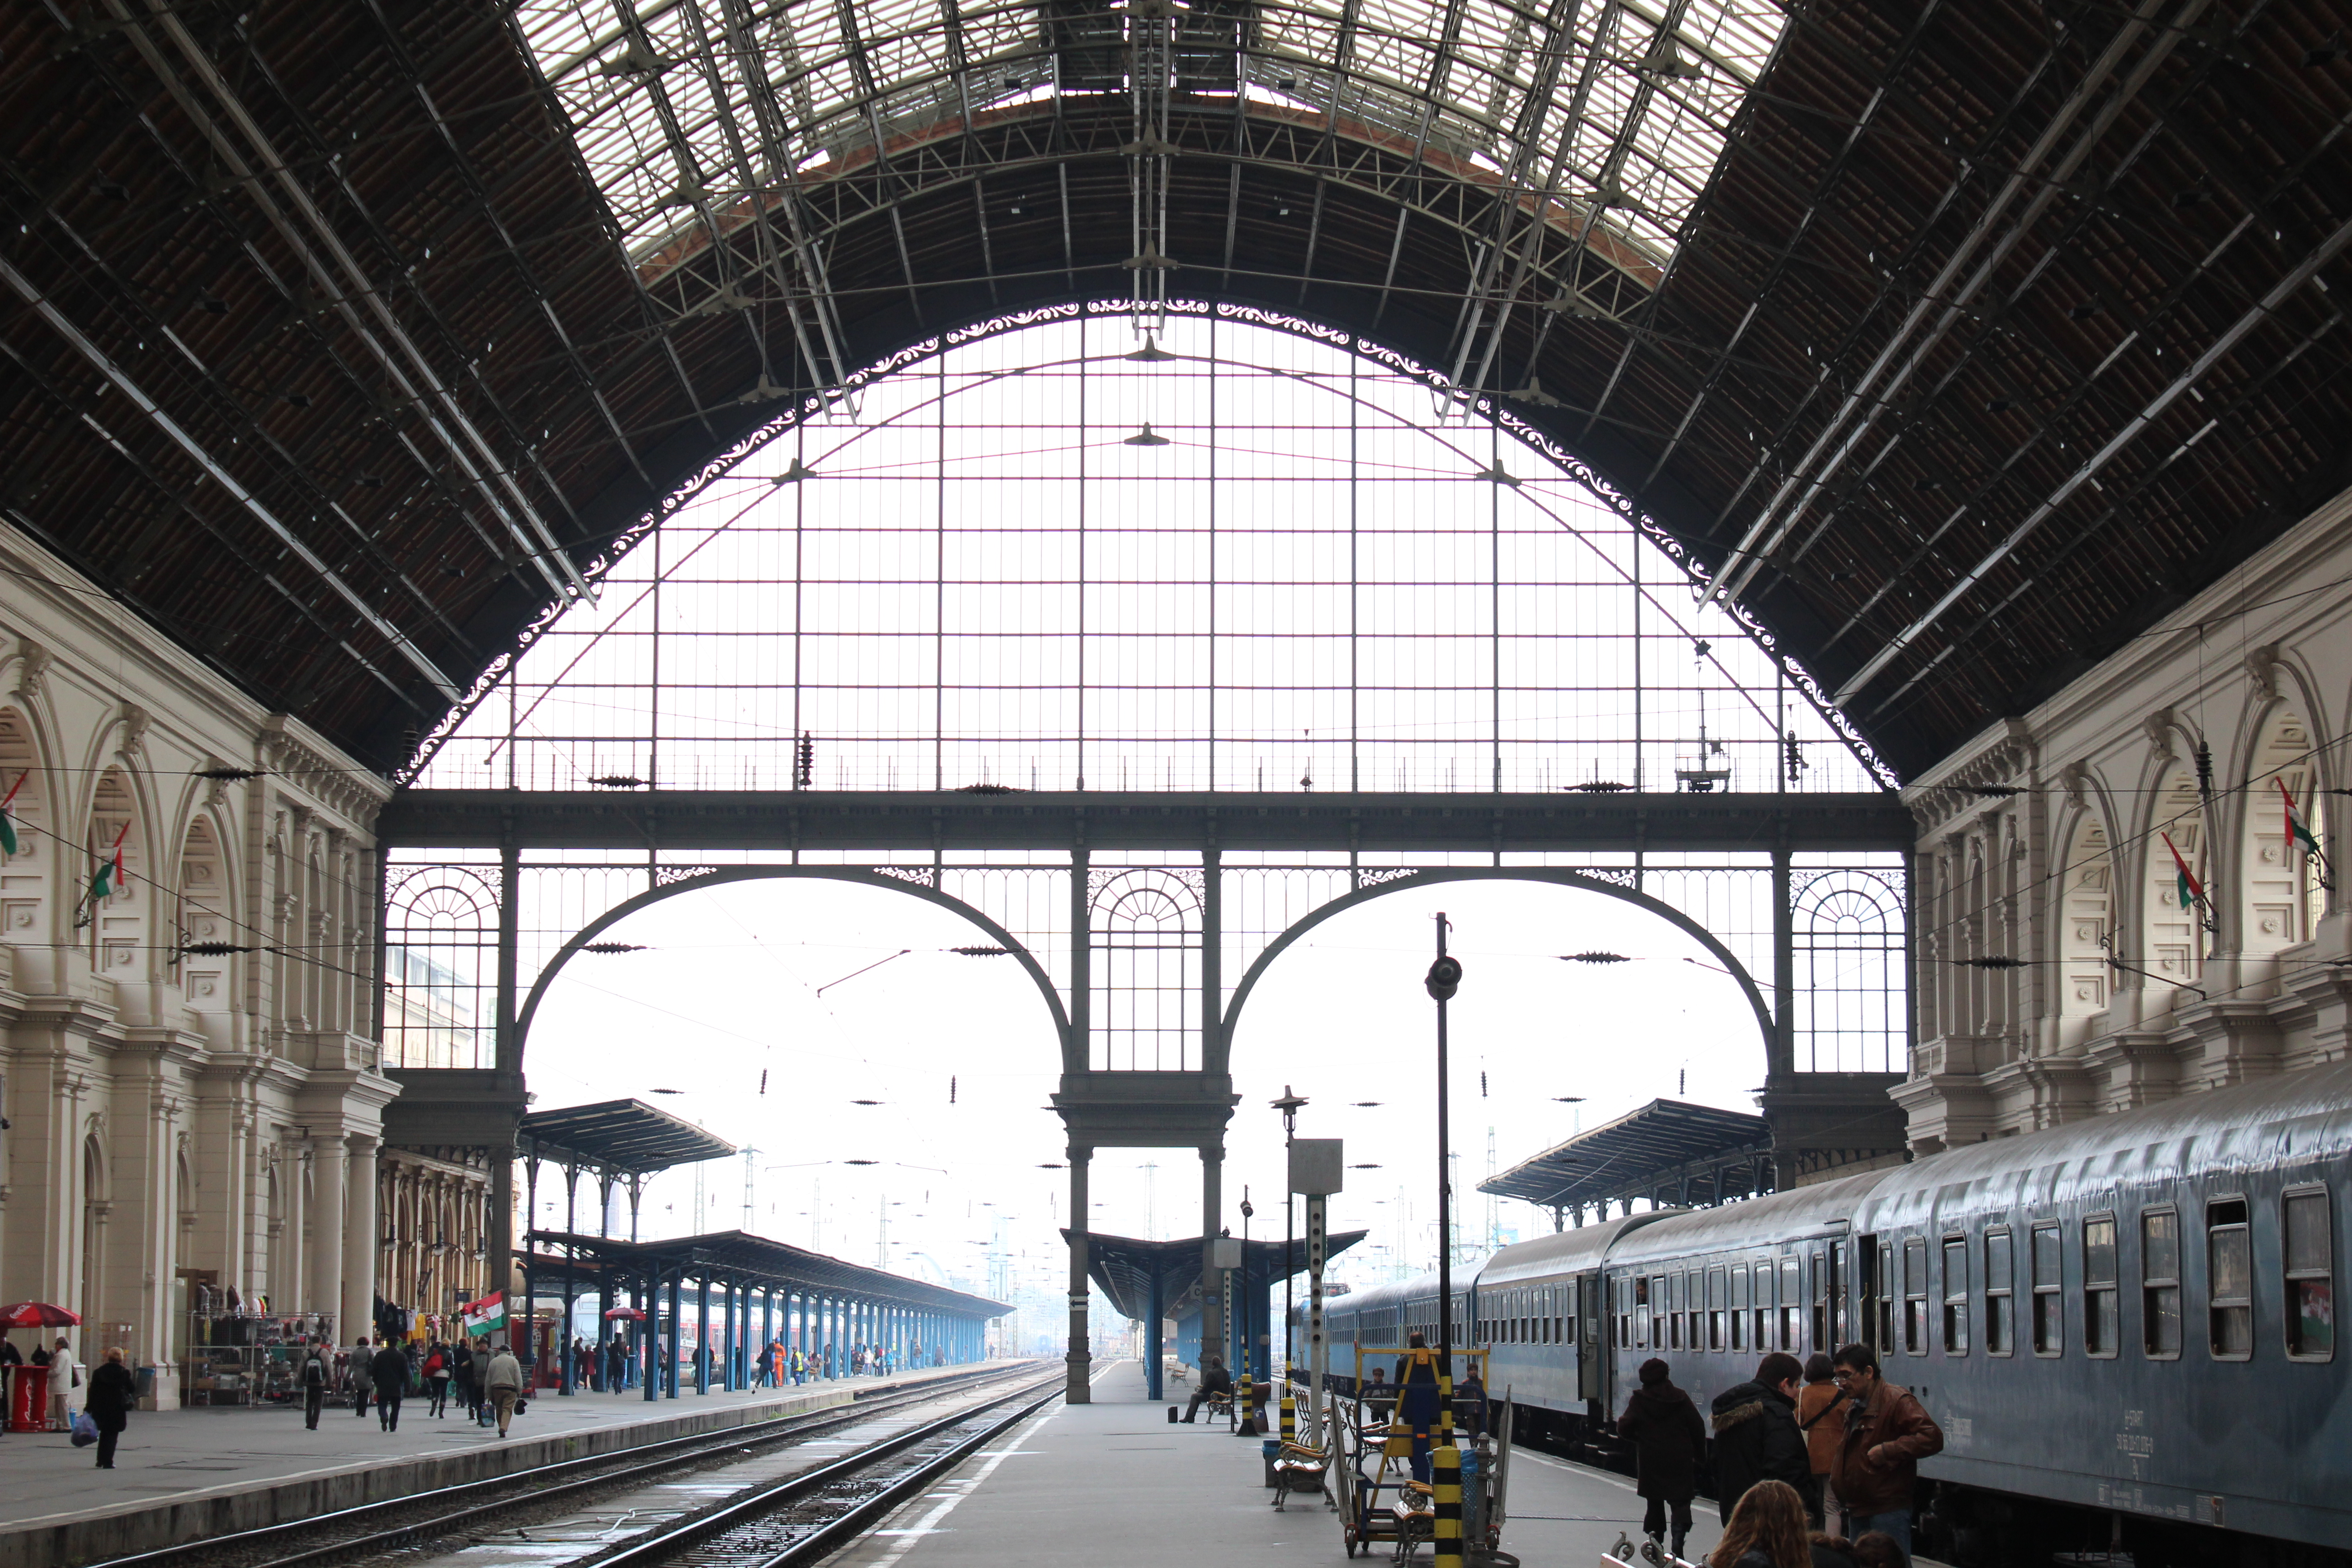 Keleti in budapest photo